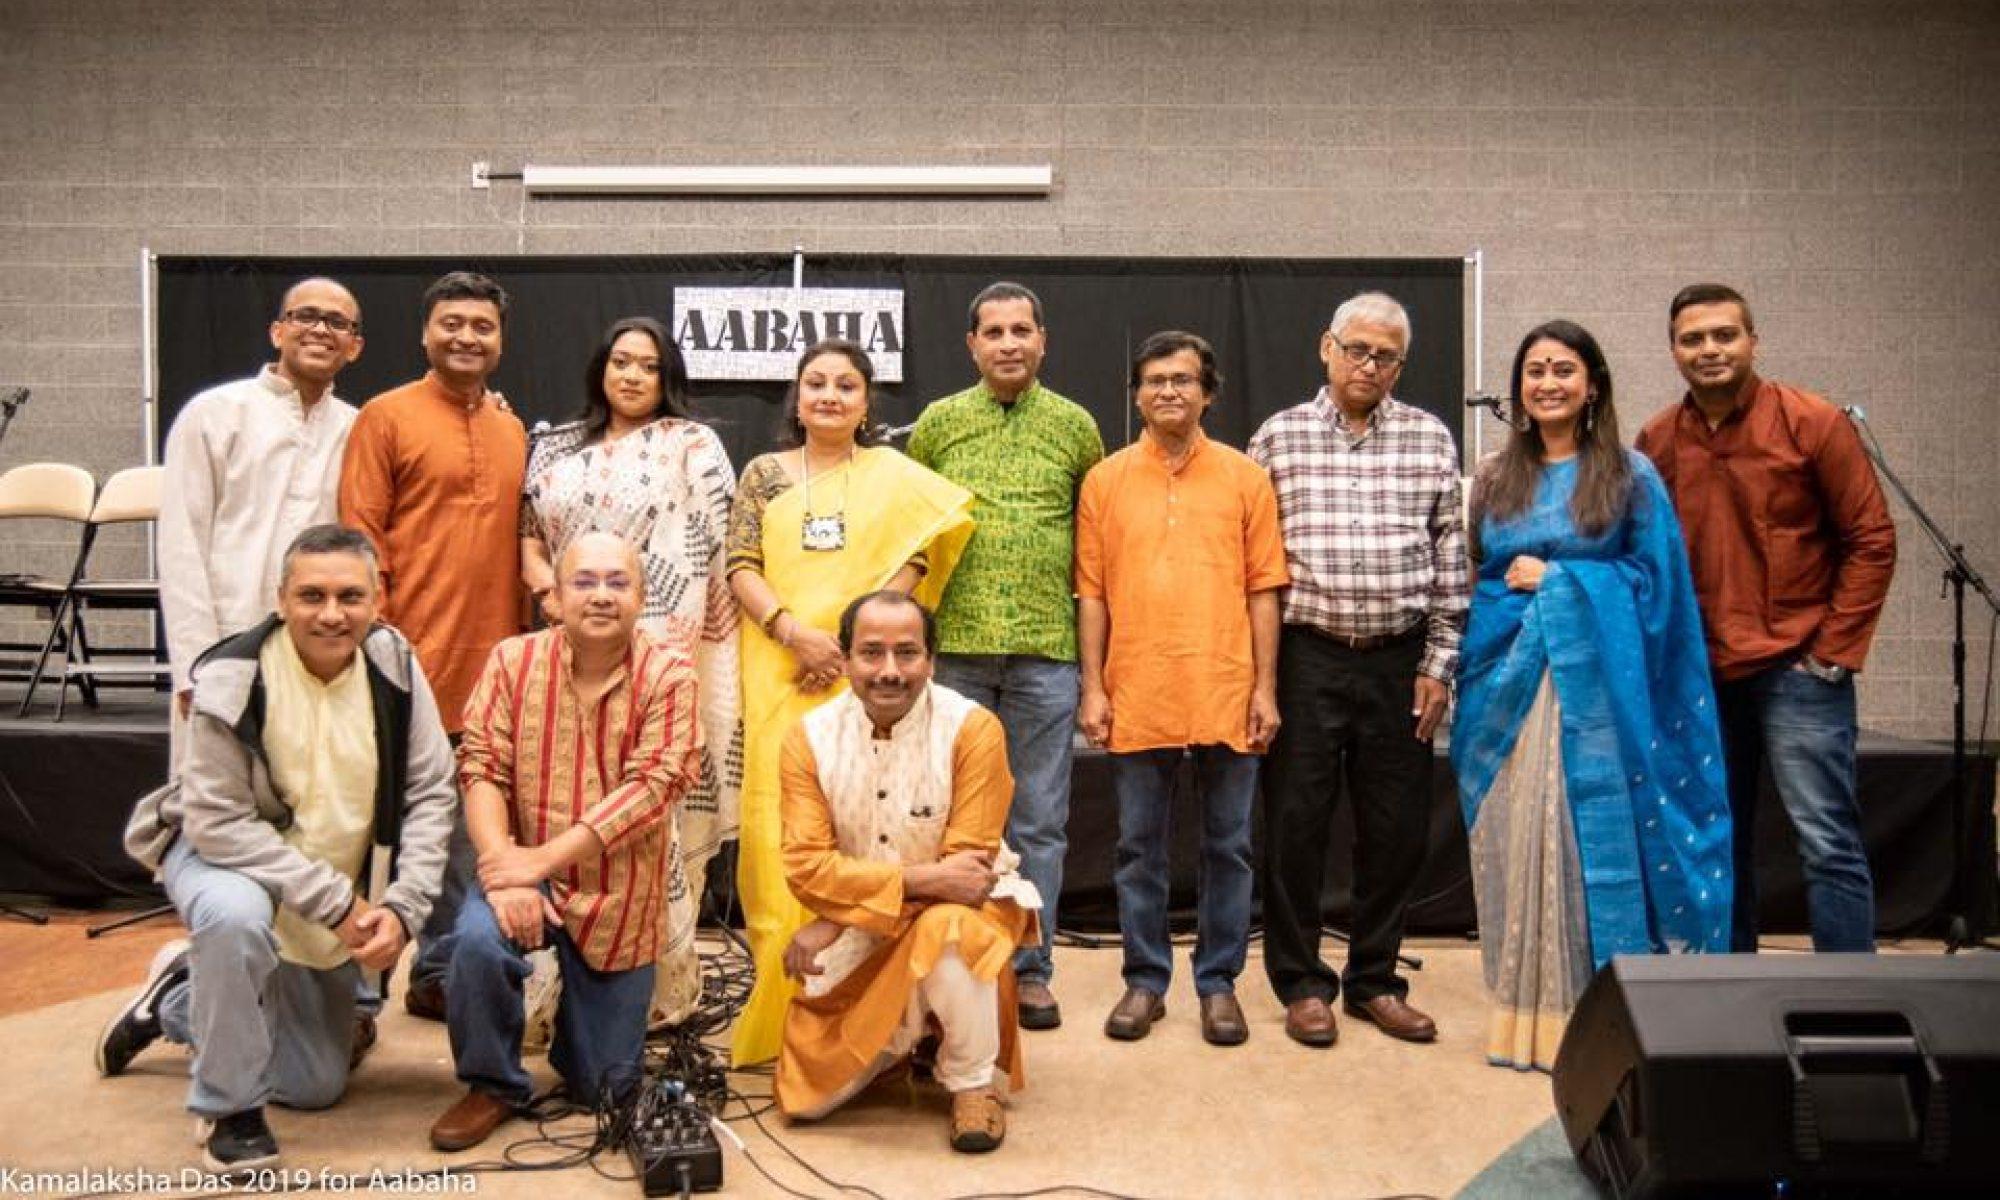 Aabaha - A Theater Group